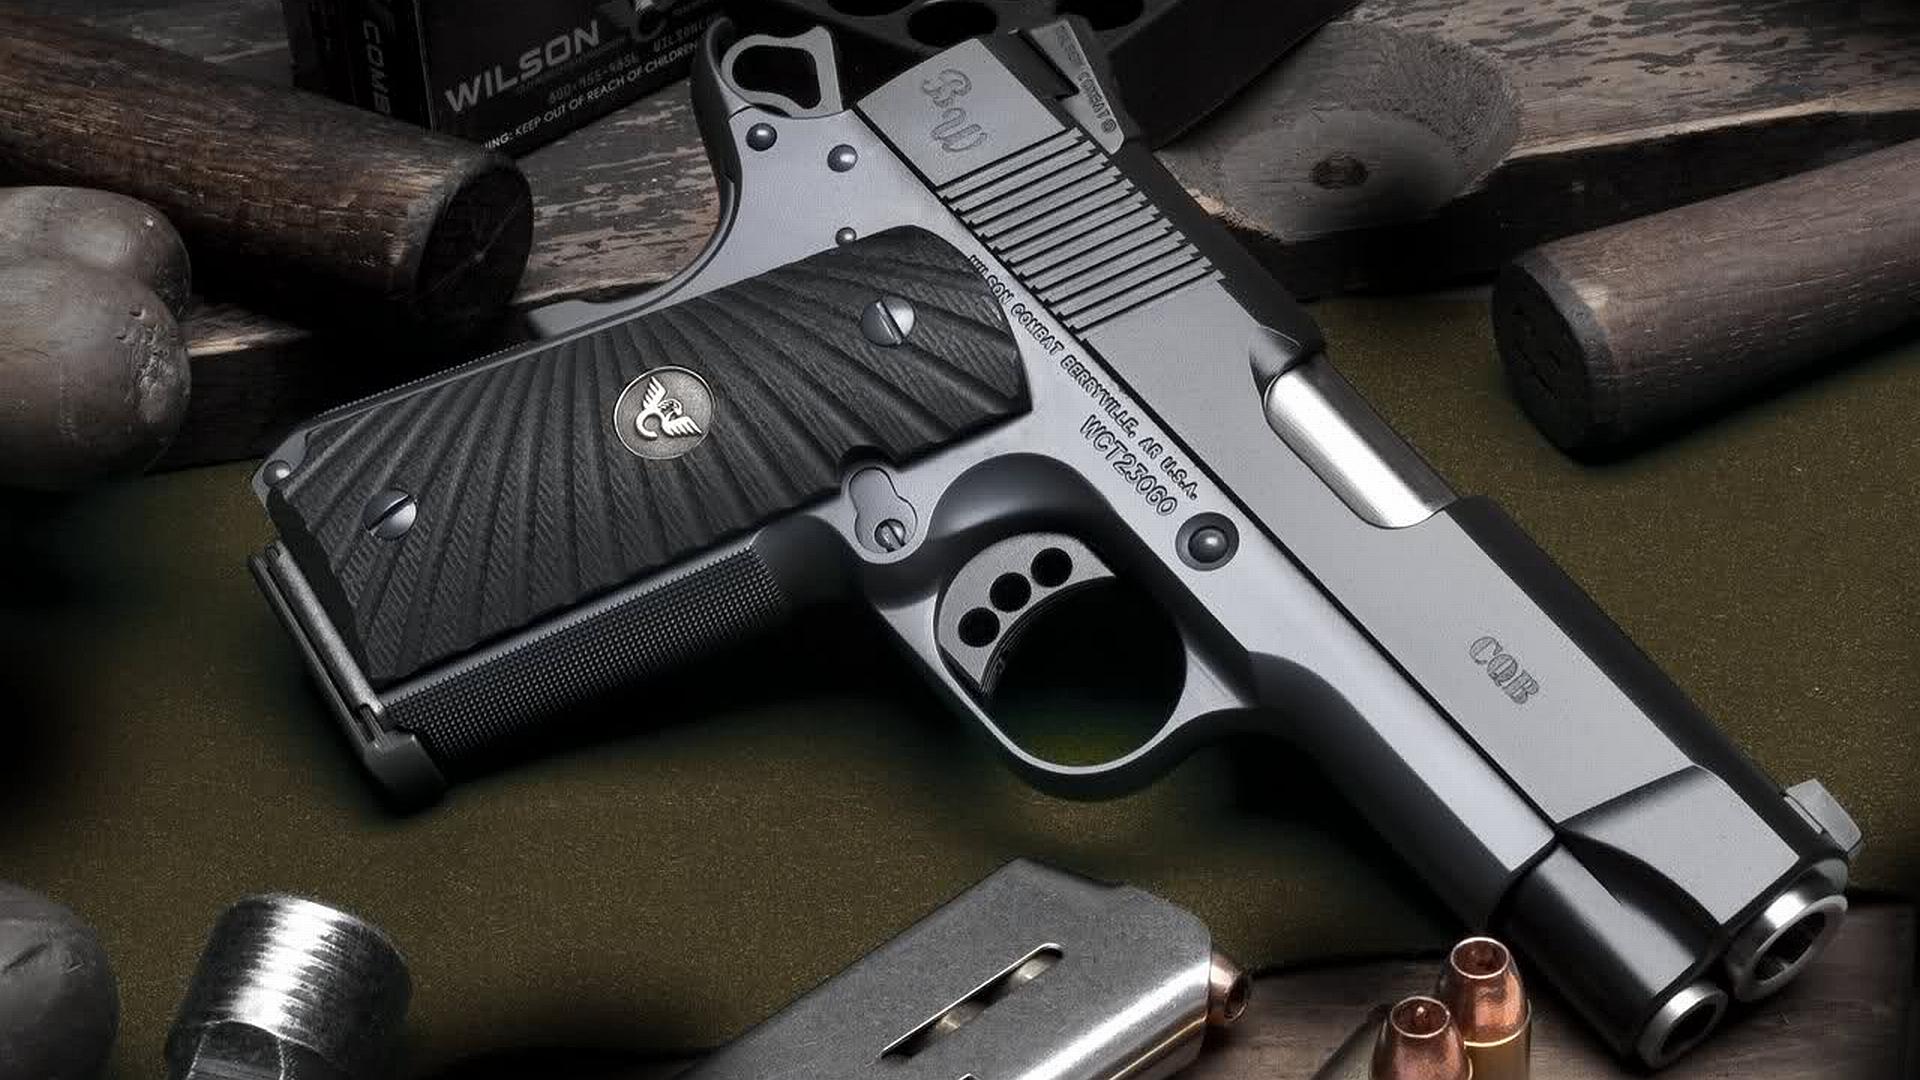 pistol hd wallpaper | background image | 1920x1080 | id:154239